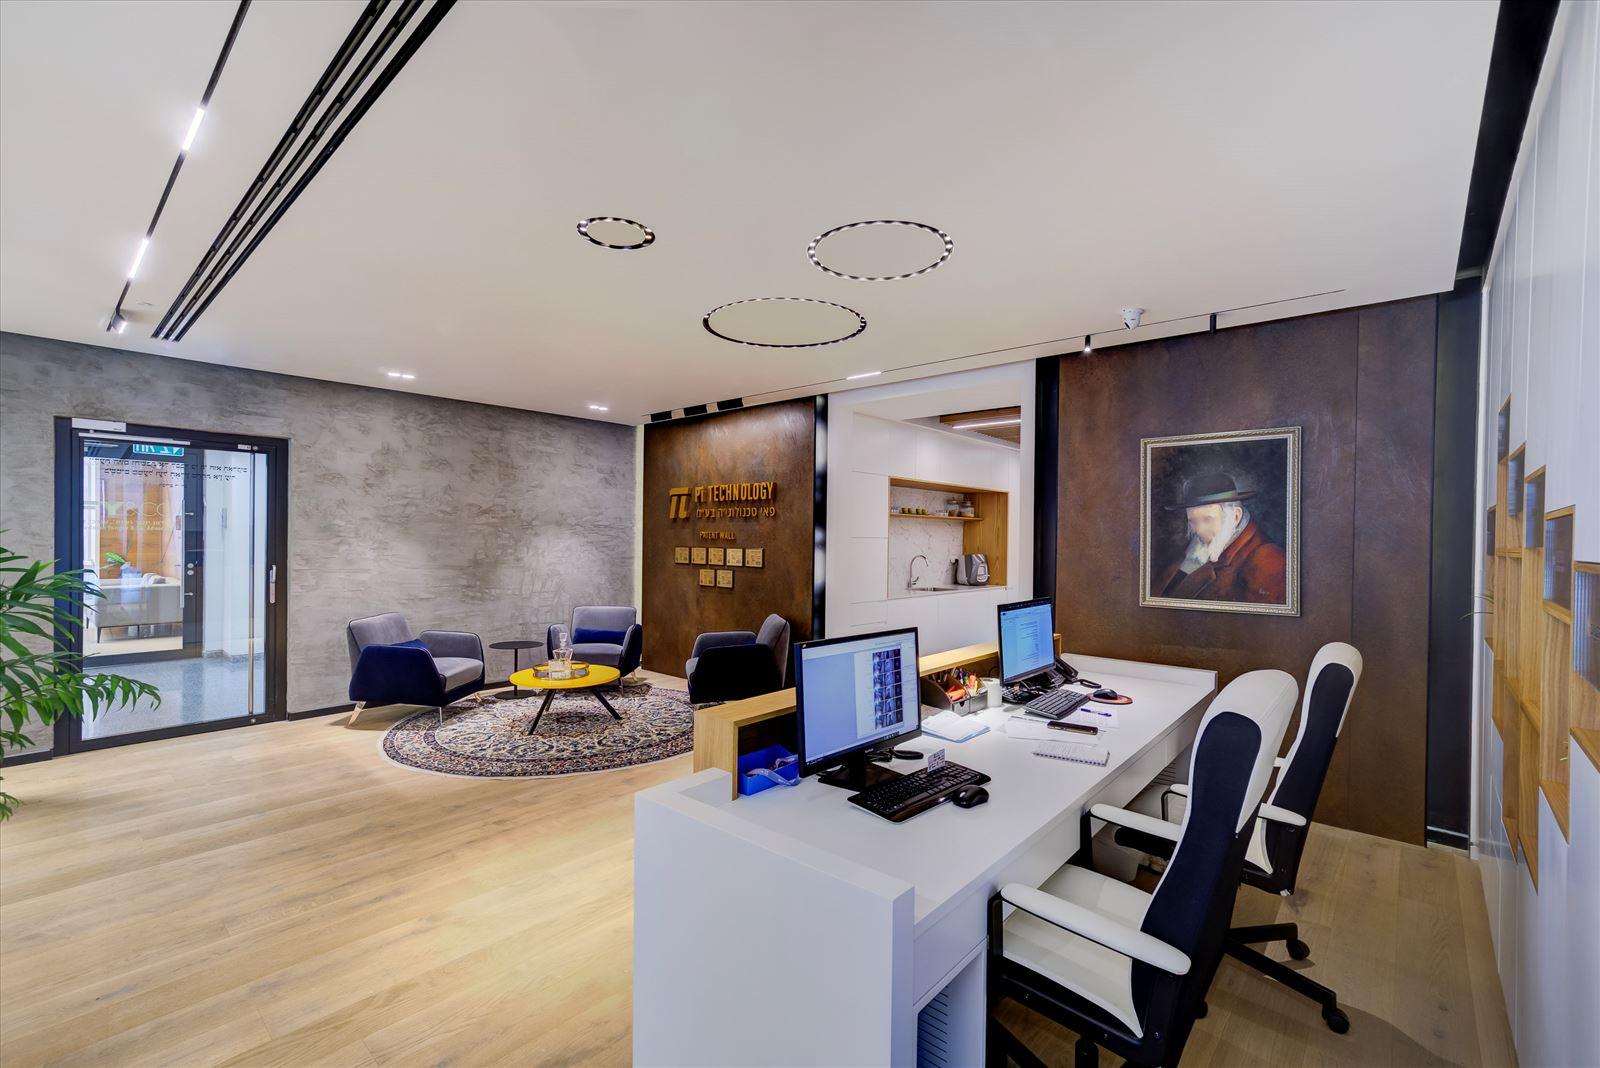 Pie Technology Office - פרויקט תאורה במשרדי פאי טכנולוגי